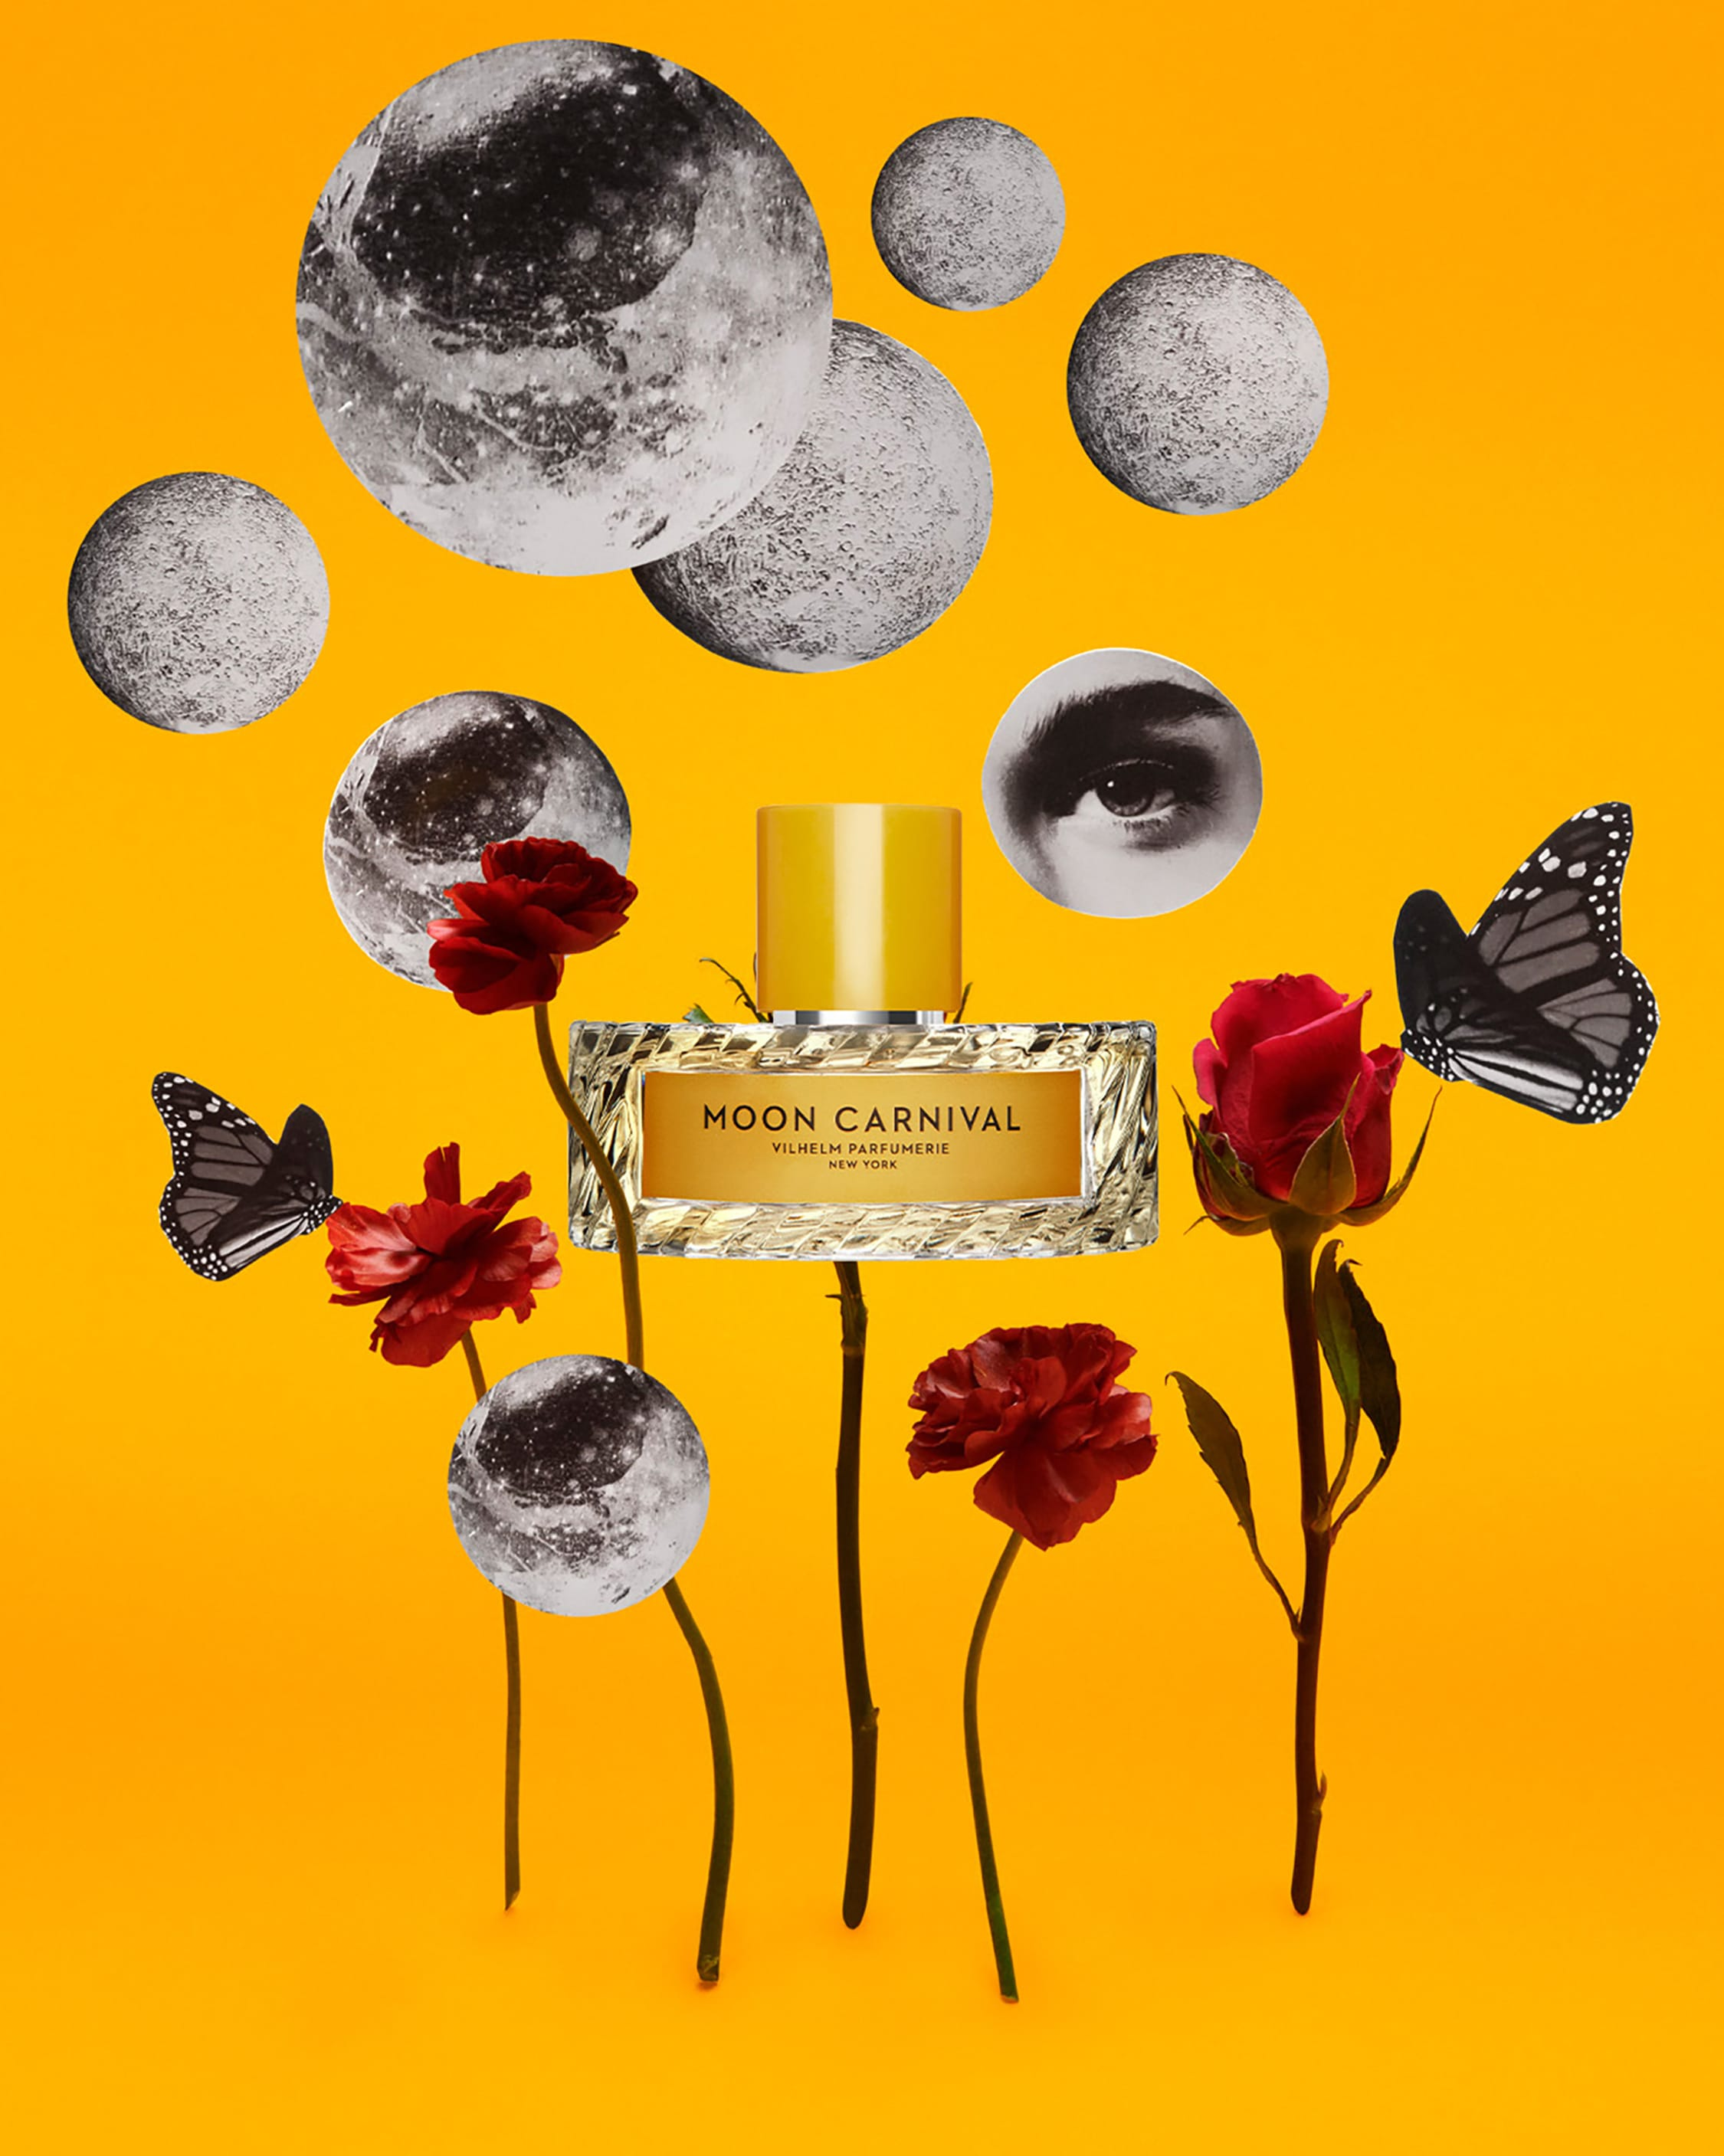 Vilhelm Perfumerie Moon Carnival Eau de Parfum 50ml 2